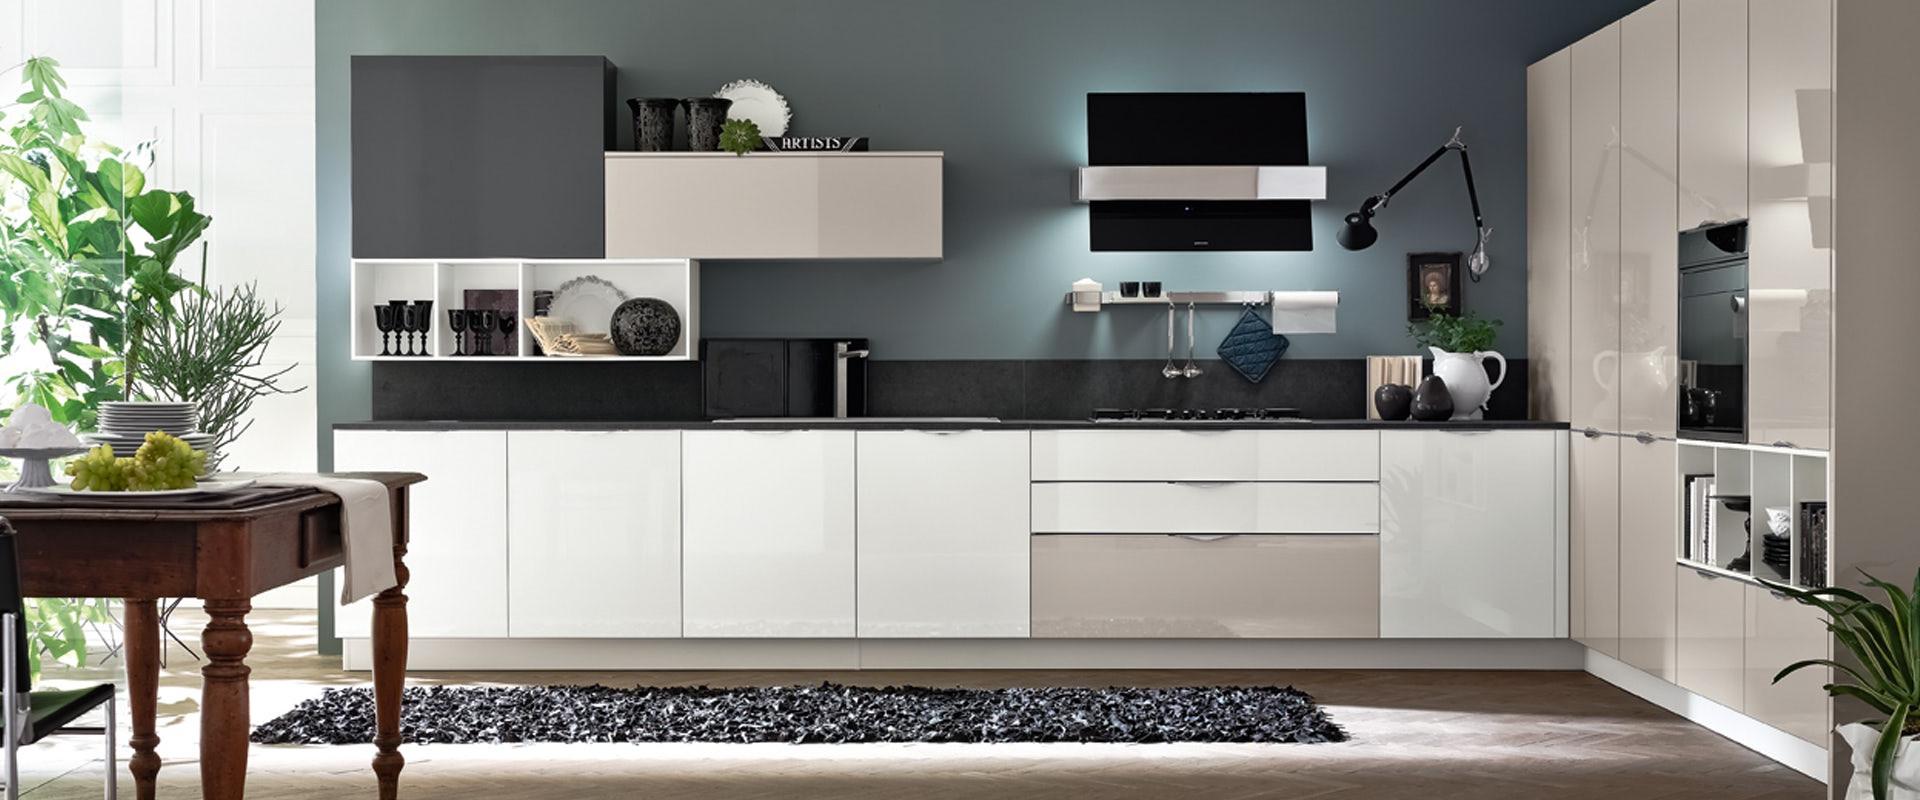 stosa-cucine-moderne-aleve-111.jpg